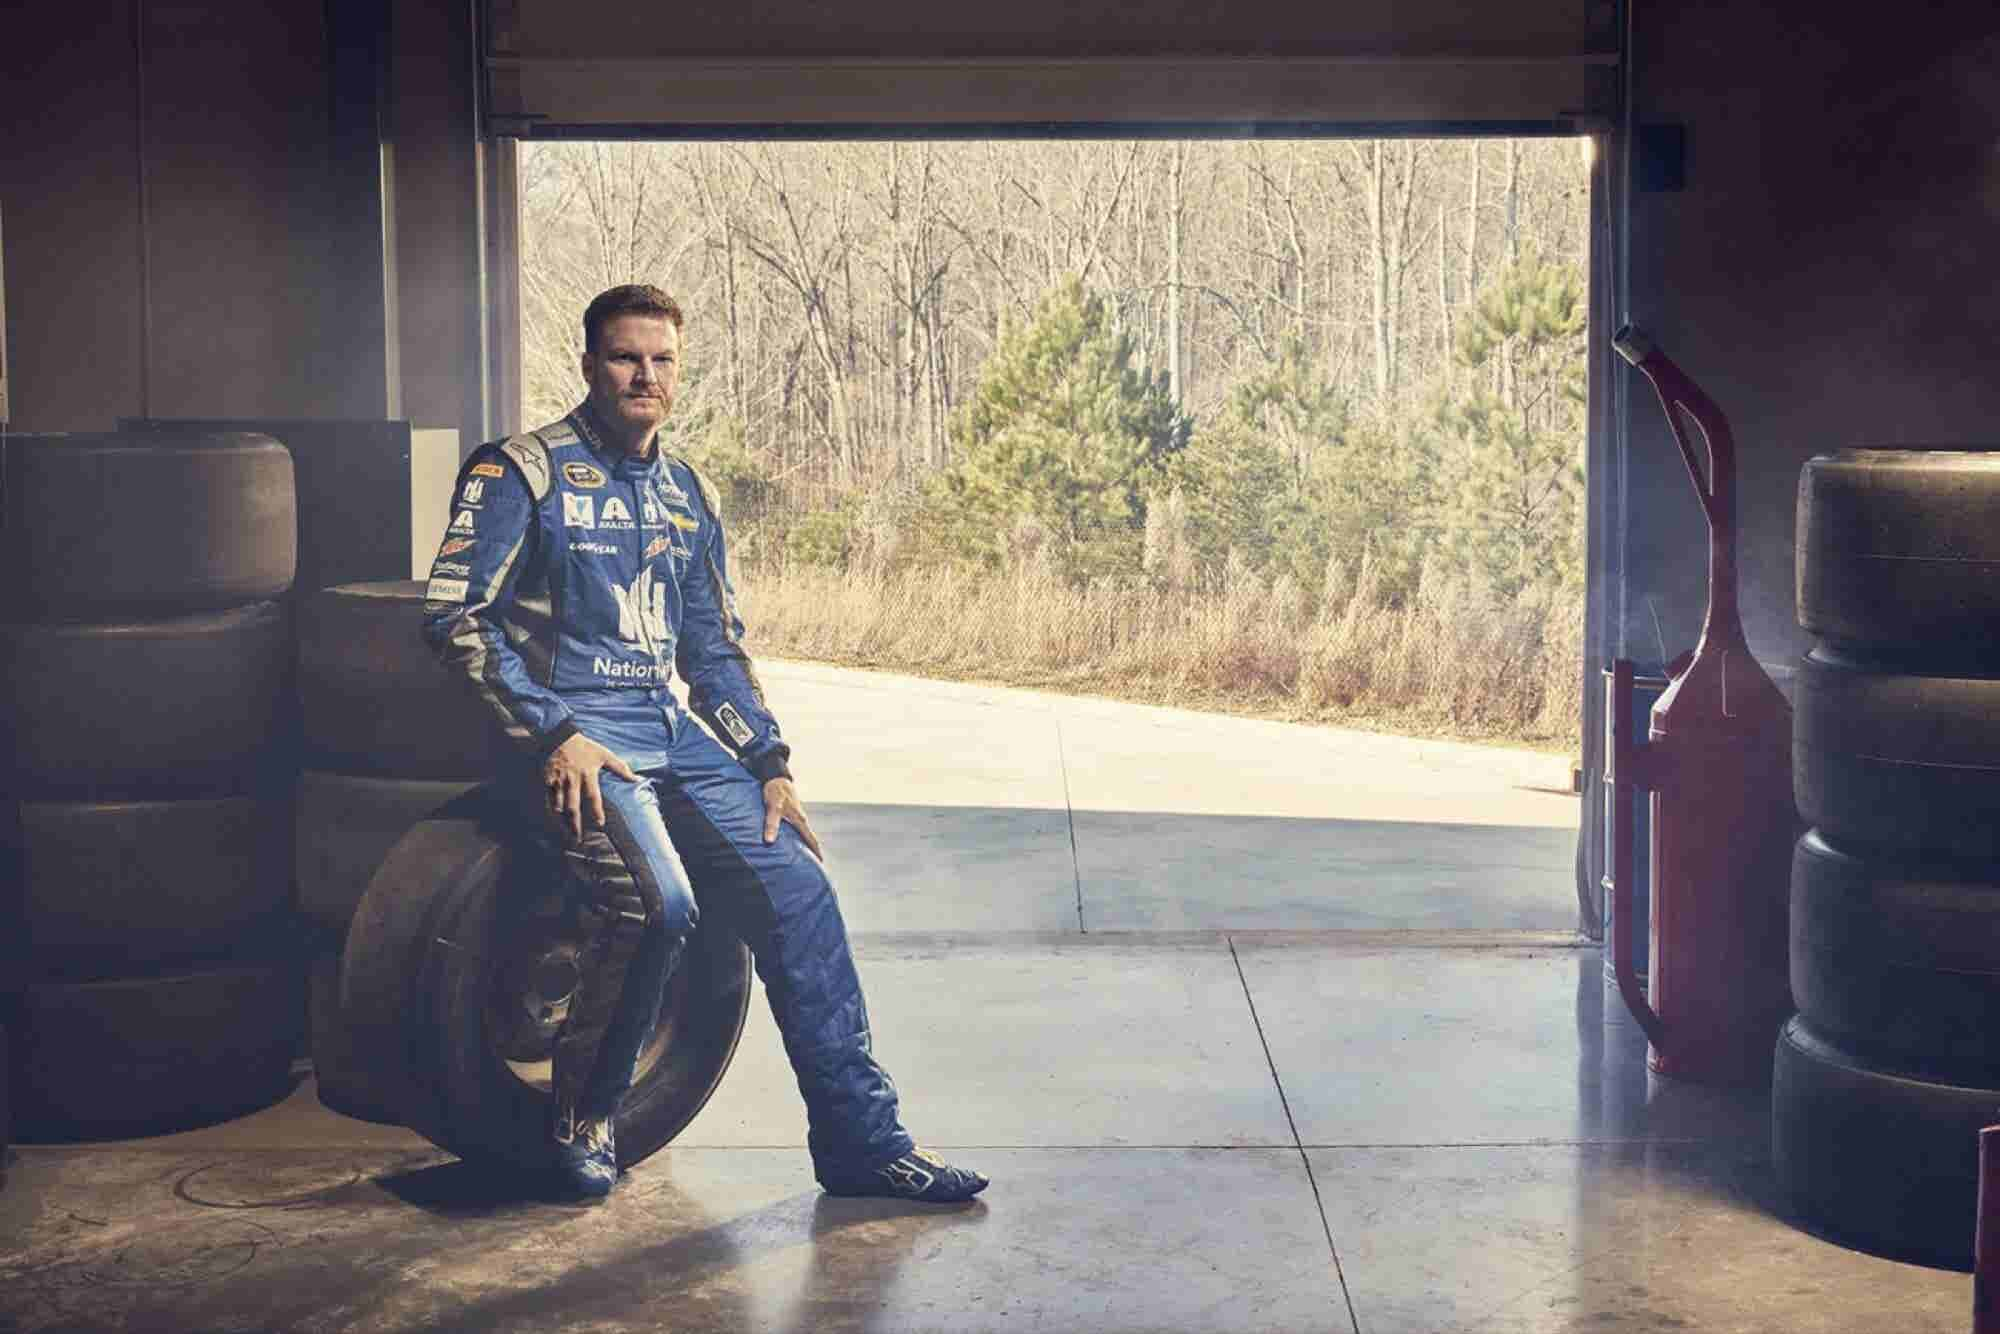 7 Speedy Business Tips From NASCAR Driver Dale Earnhardt Jr.